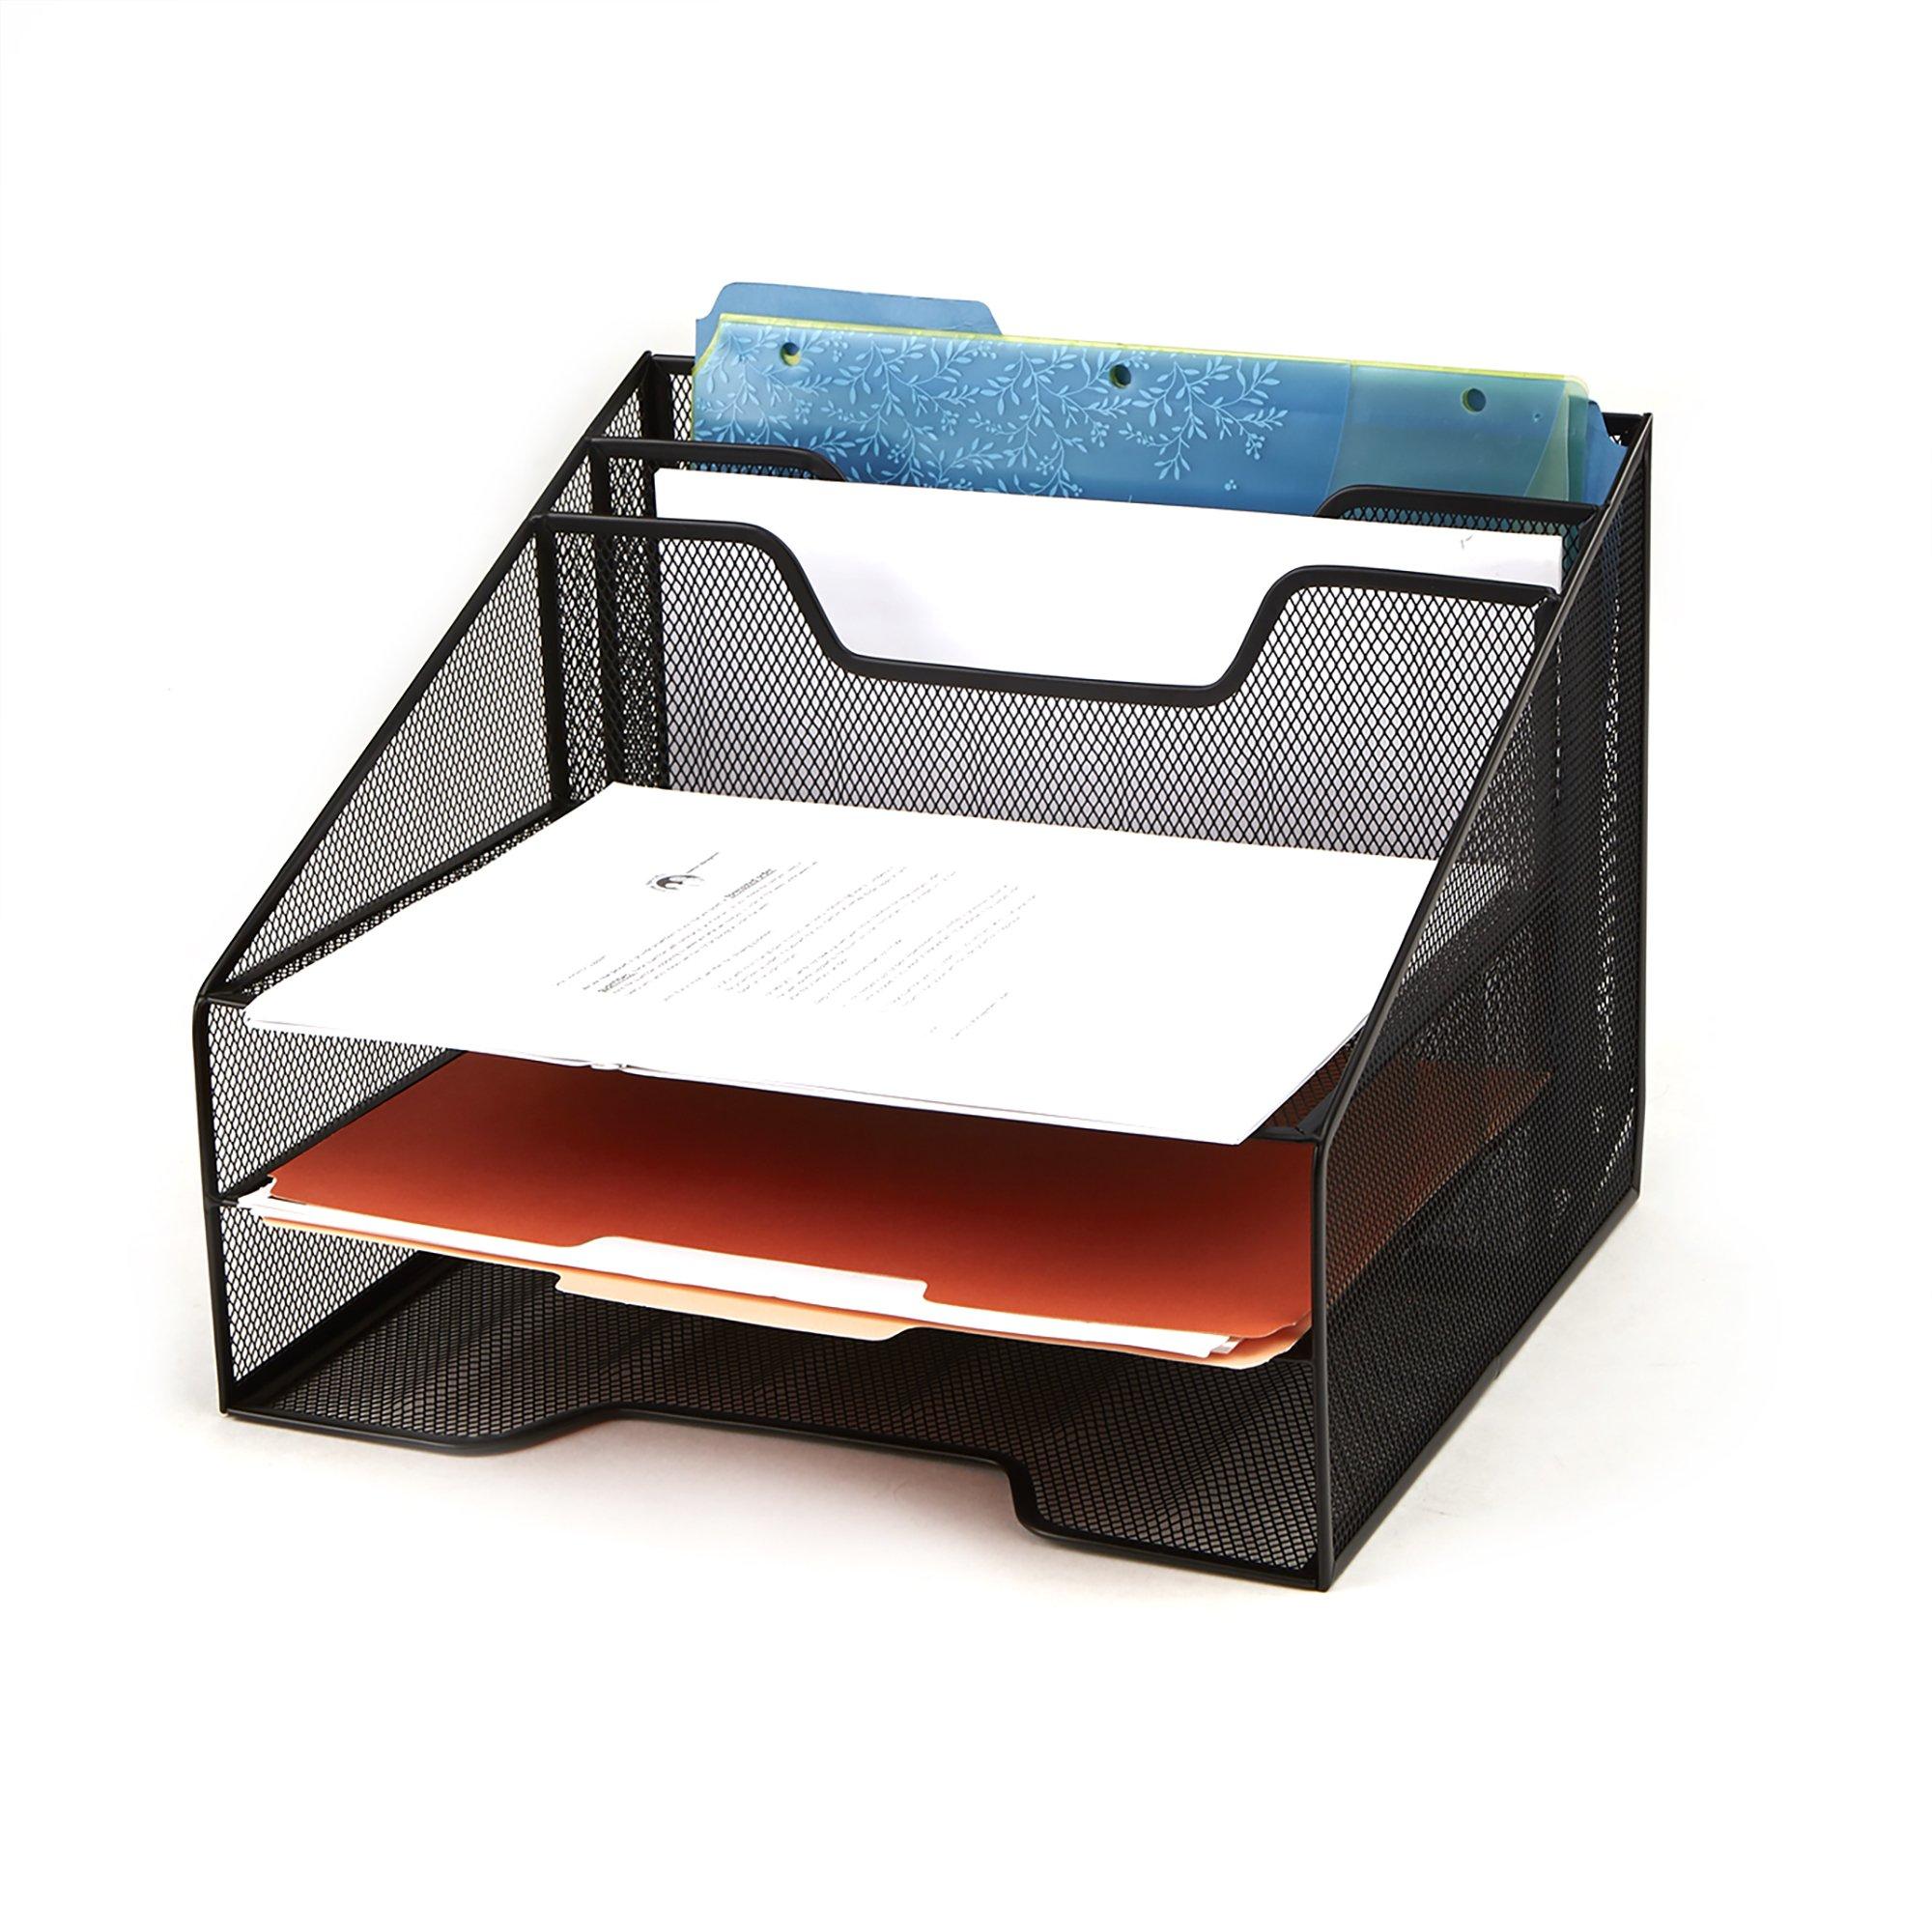 Mind Reader Mesh Desk Organizer 5 Trays Desktop Document Letter Tray for Folders, Mail, Stationary, Desk Accessories, Black by Mind Reader